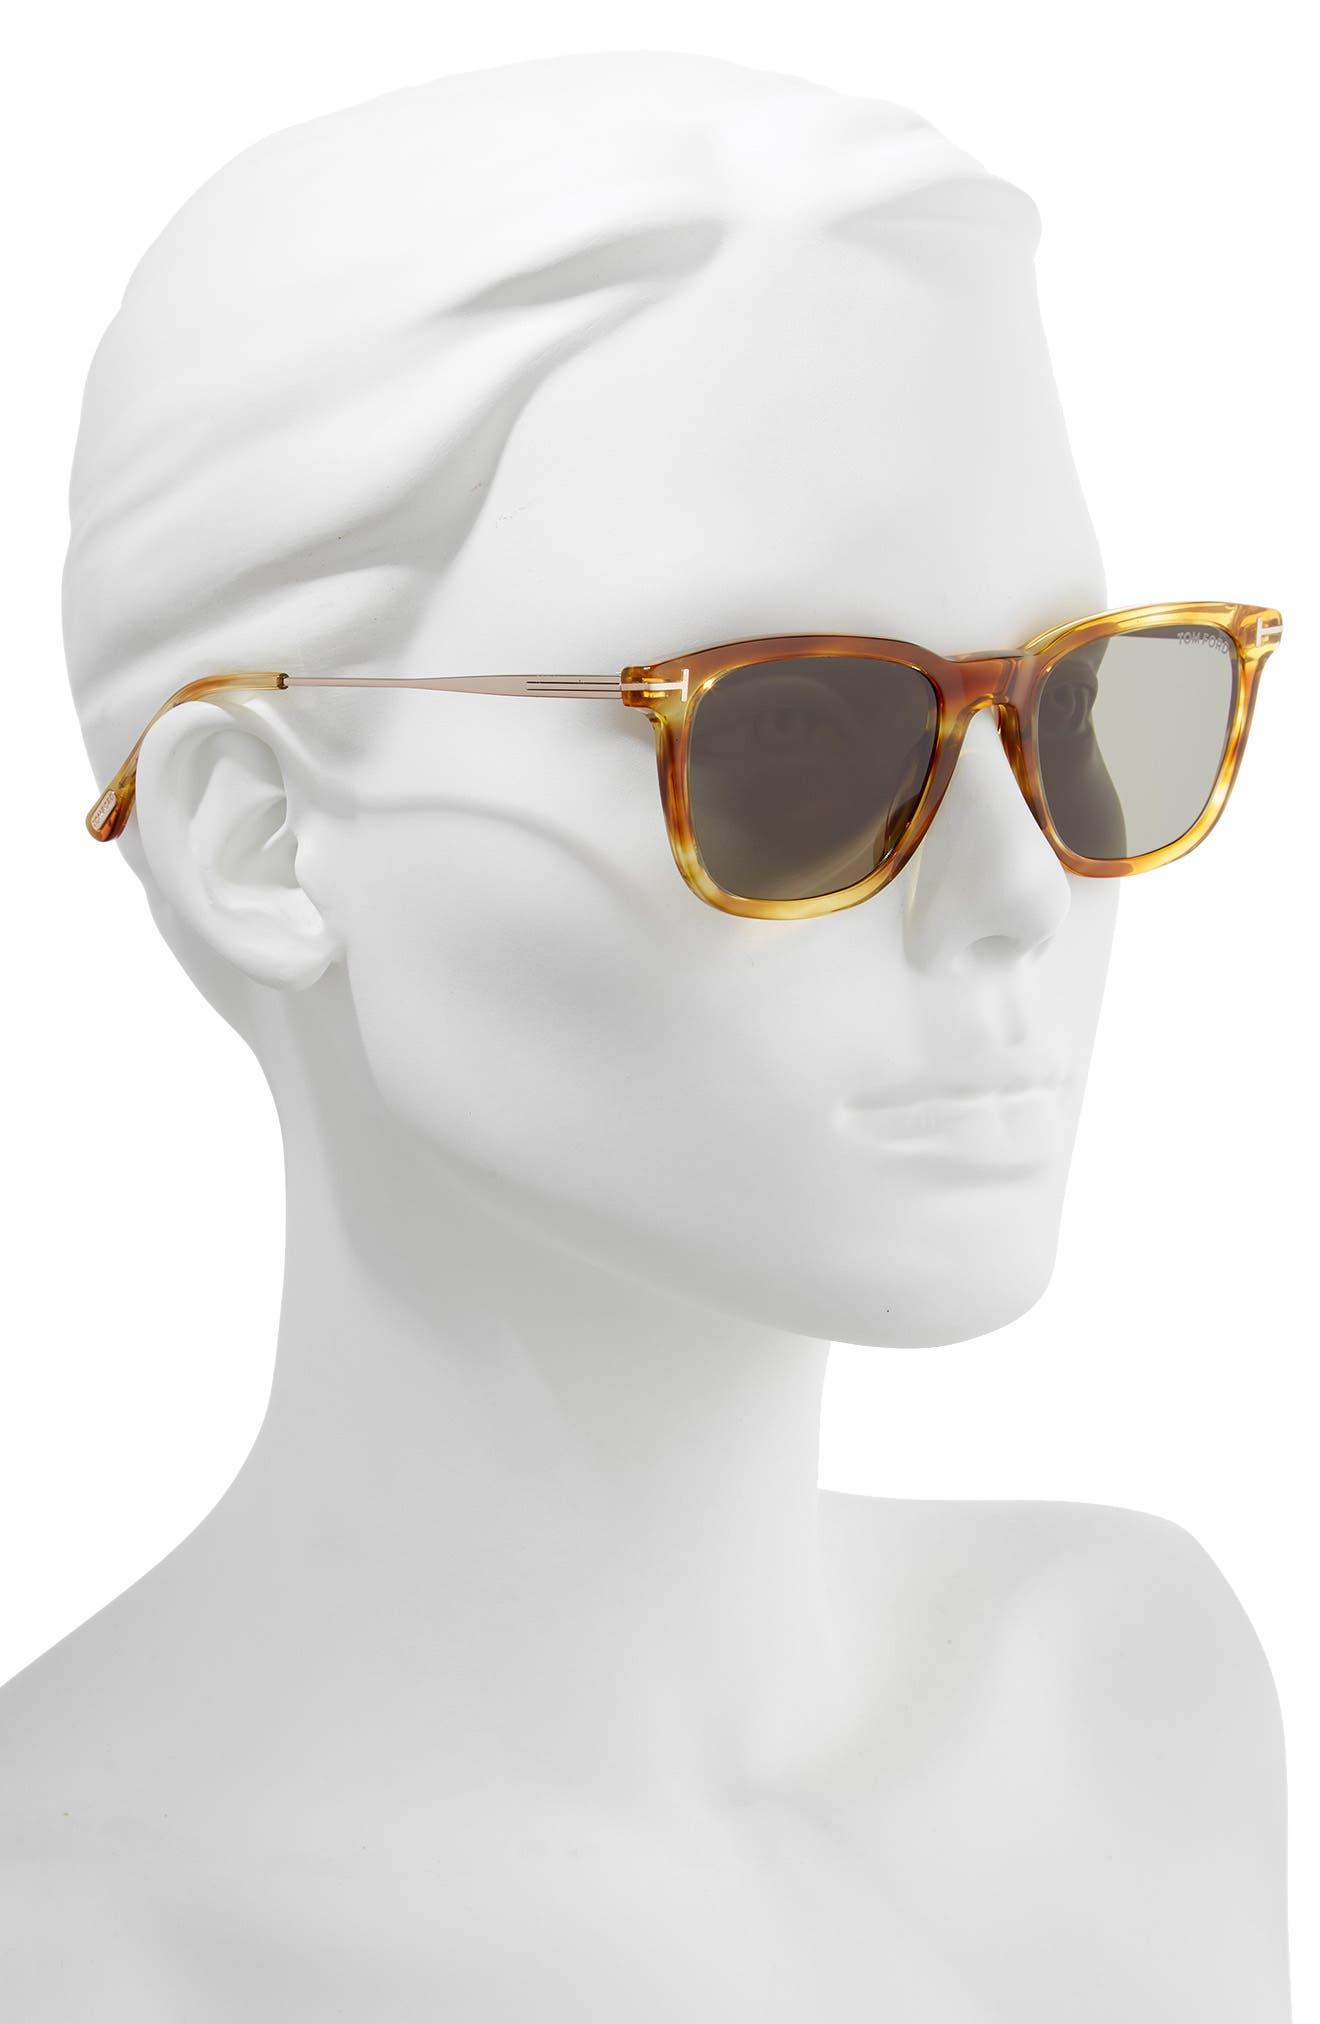 53mm Rectangle Sunglasses,                             Alternate thumbnail 2, color,                             LIGHT BROWN/ SMOKE